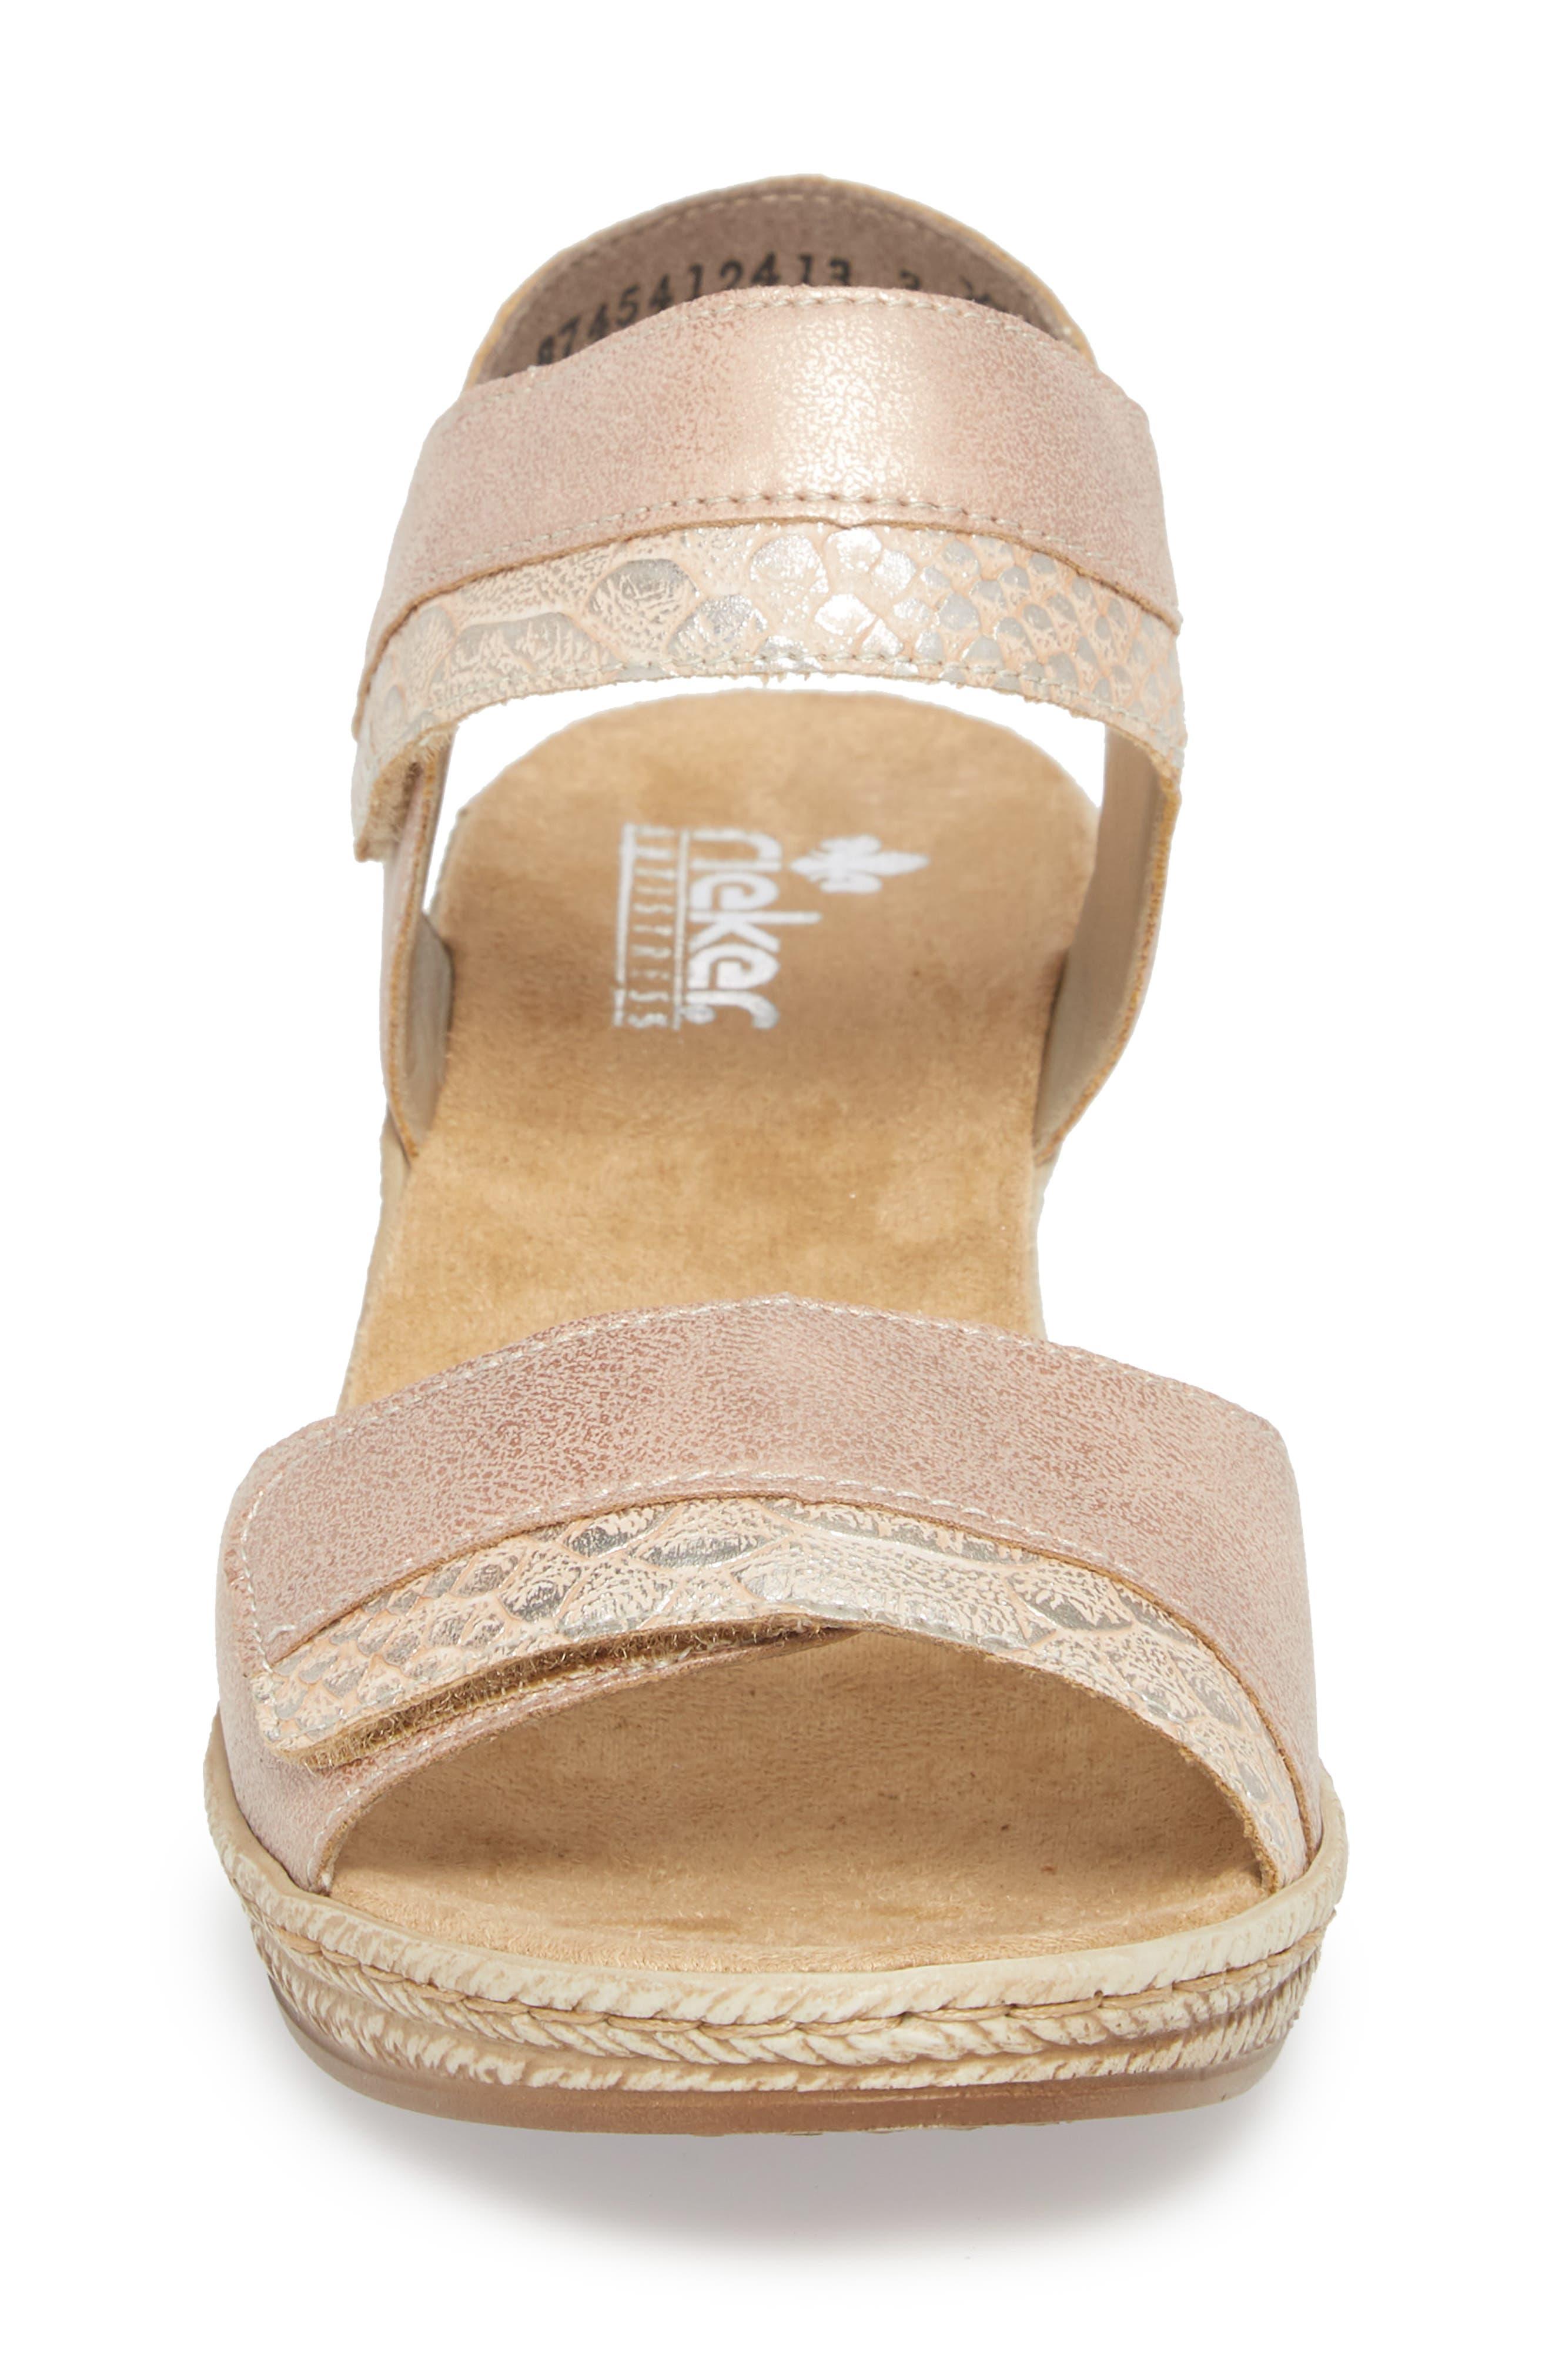 RIEKER ANTISTRESS,                             Fanni 70 Wedge Sandal,                             Alternate thumbnail 4, color,                             ROSE/ GINGER